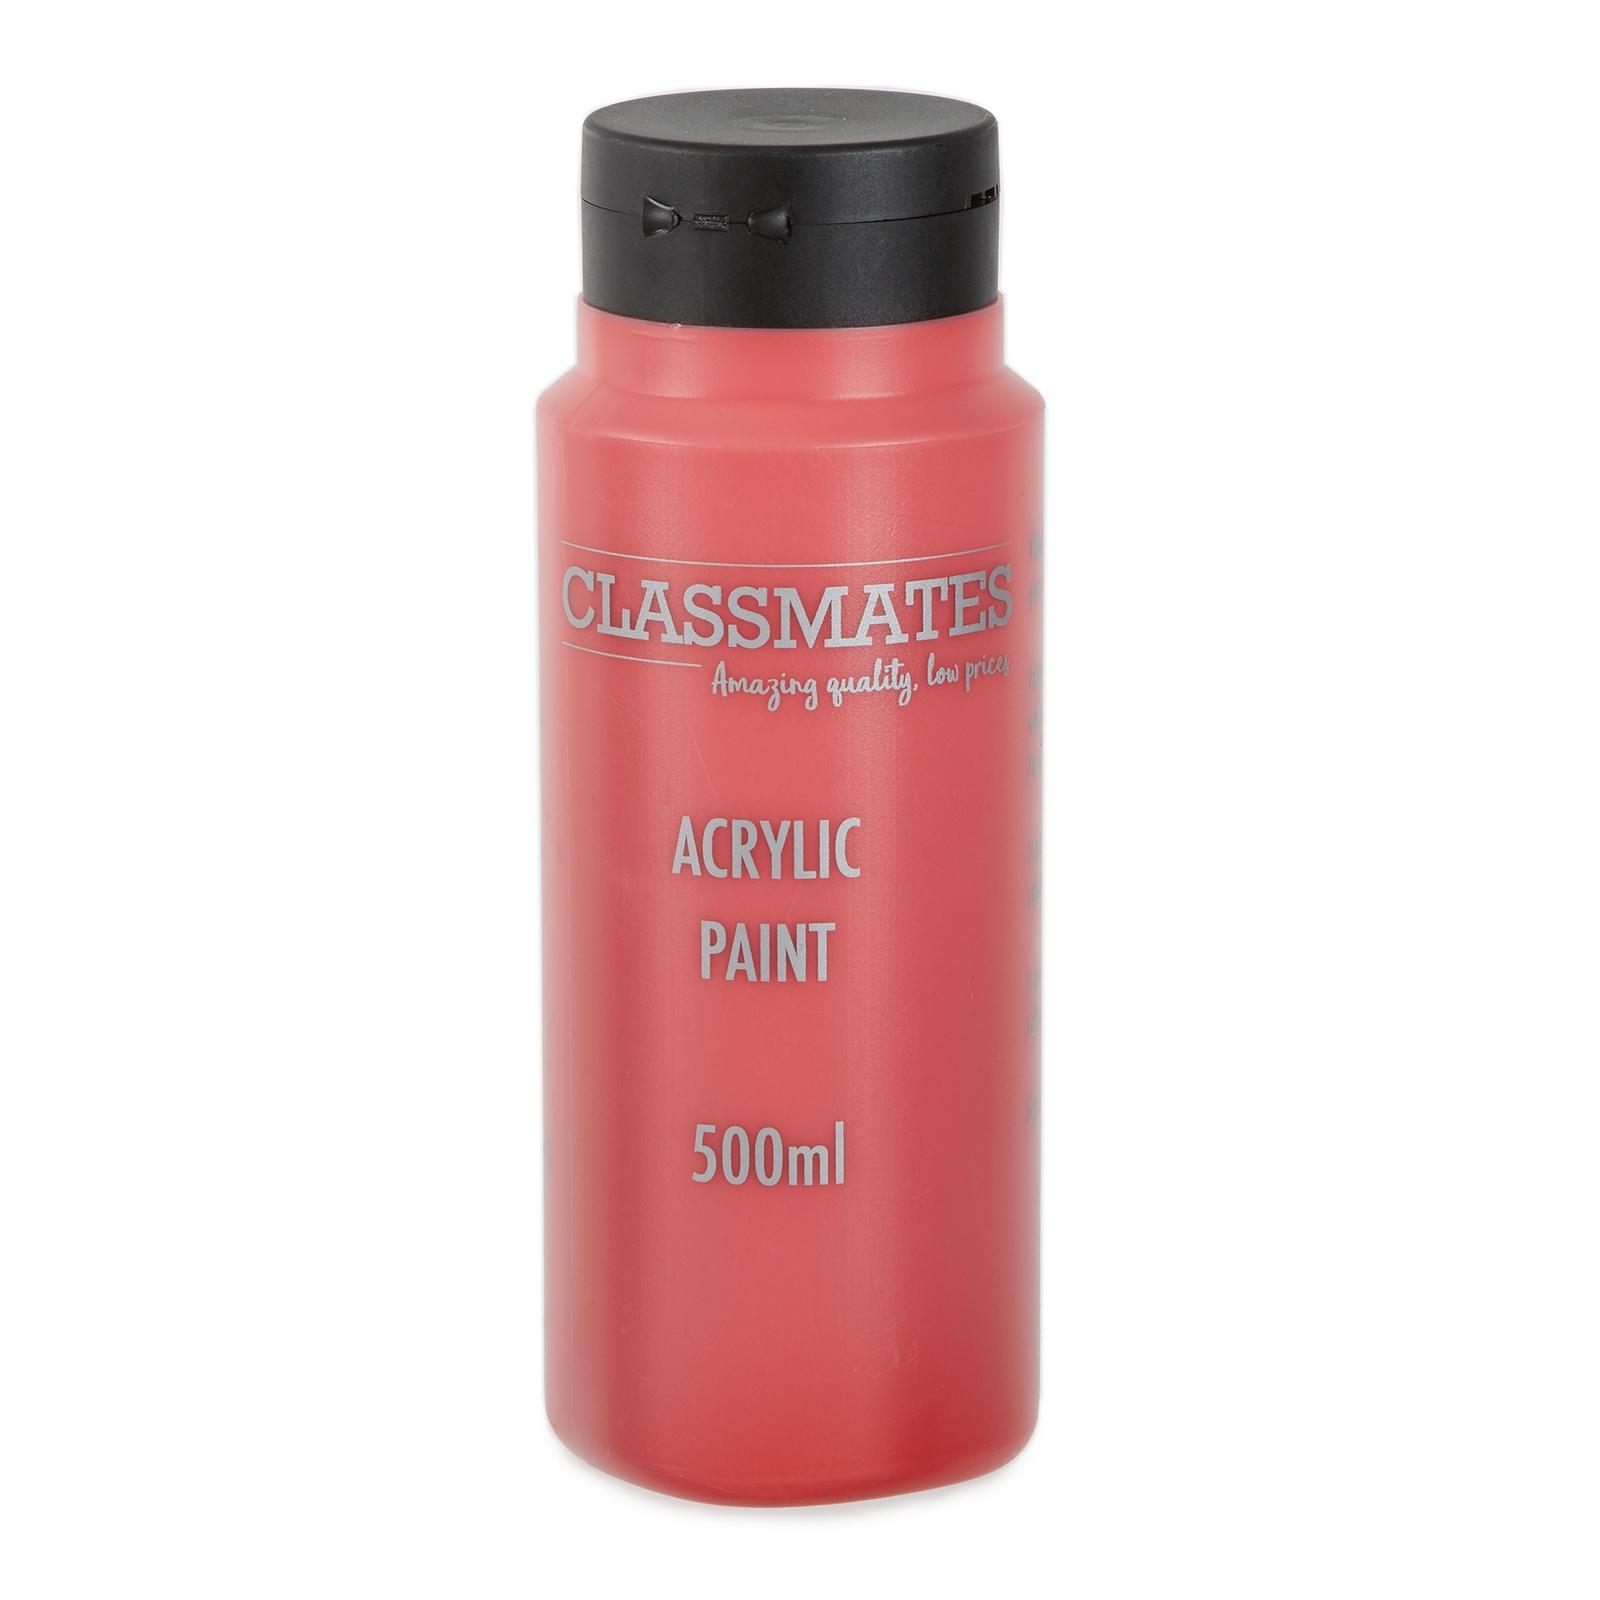 Classmates Acrylic Paint in Scarlet Red - 500ml Bottle